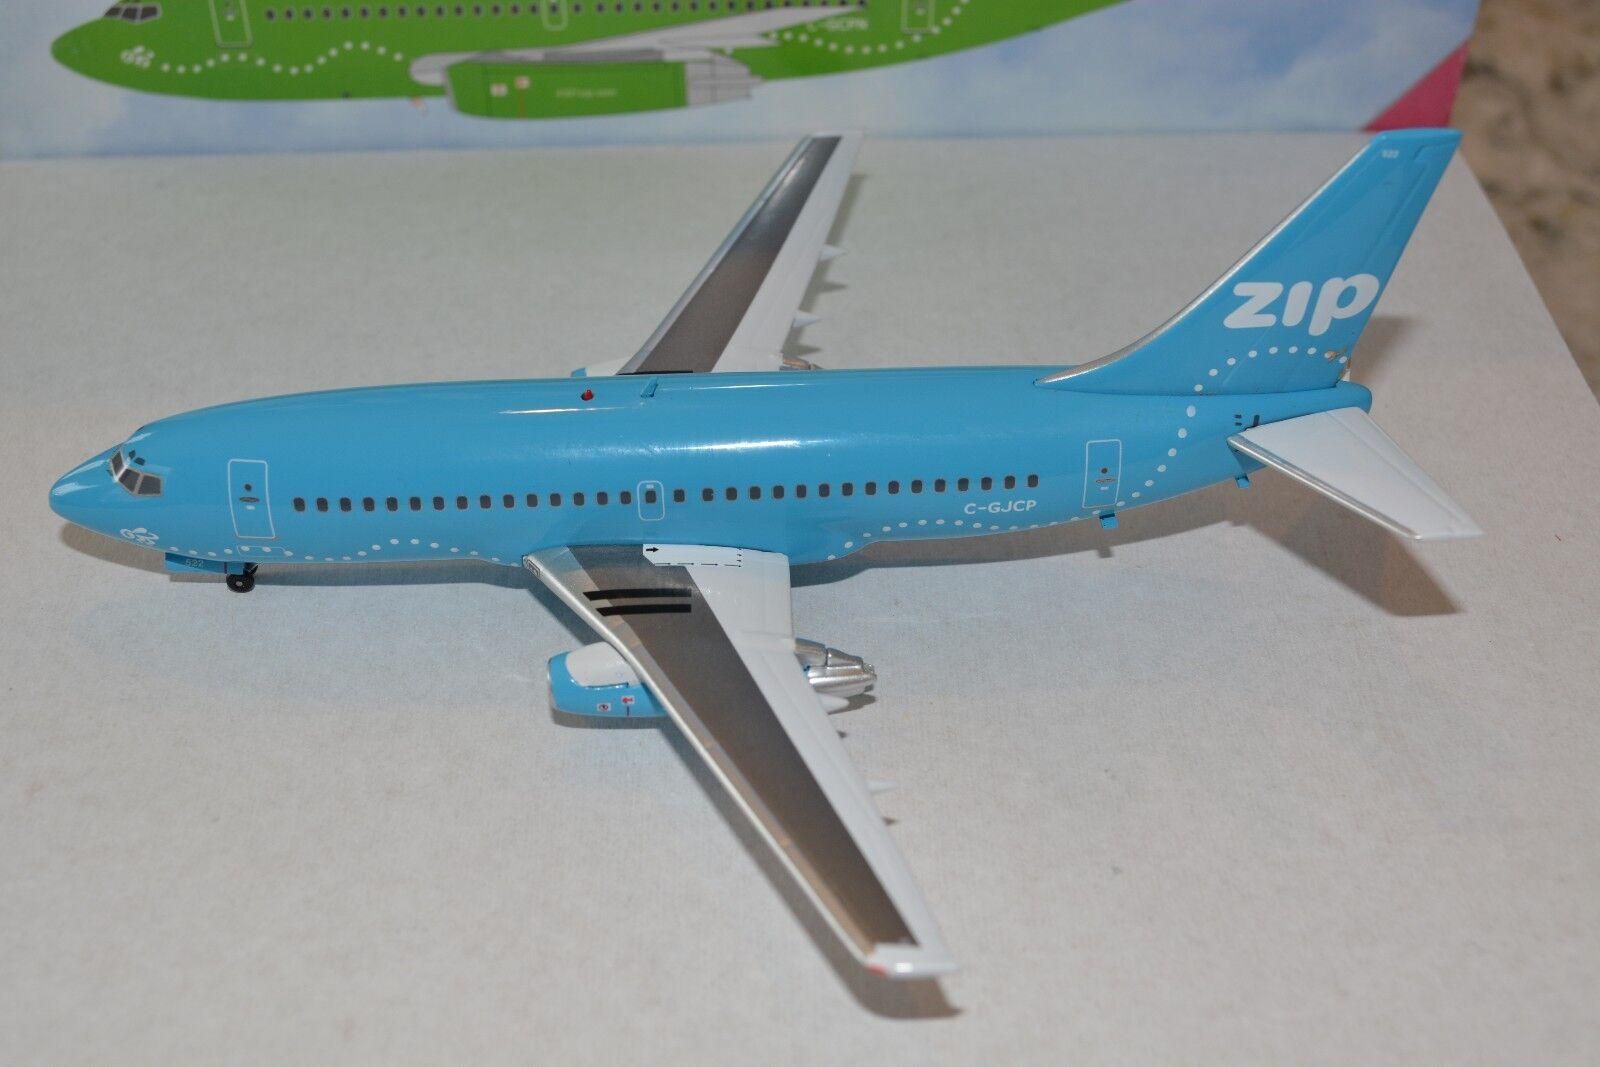 Inflight 200 IF732048 1 200 ZIP Airlines Boeing 737-200  Blau  Jellybean, NIB